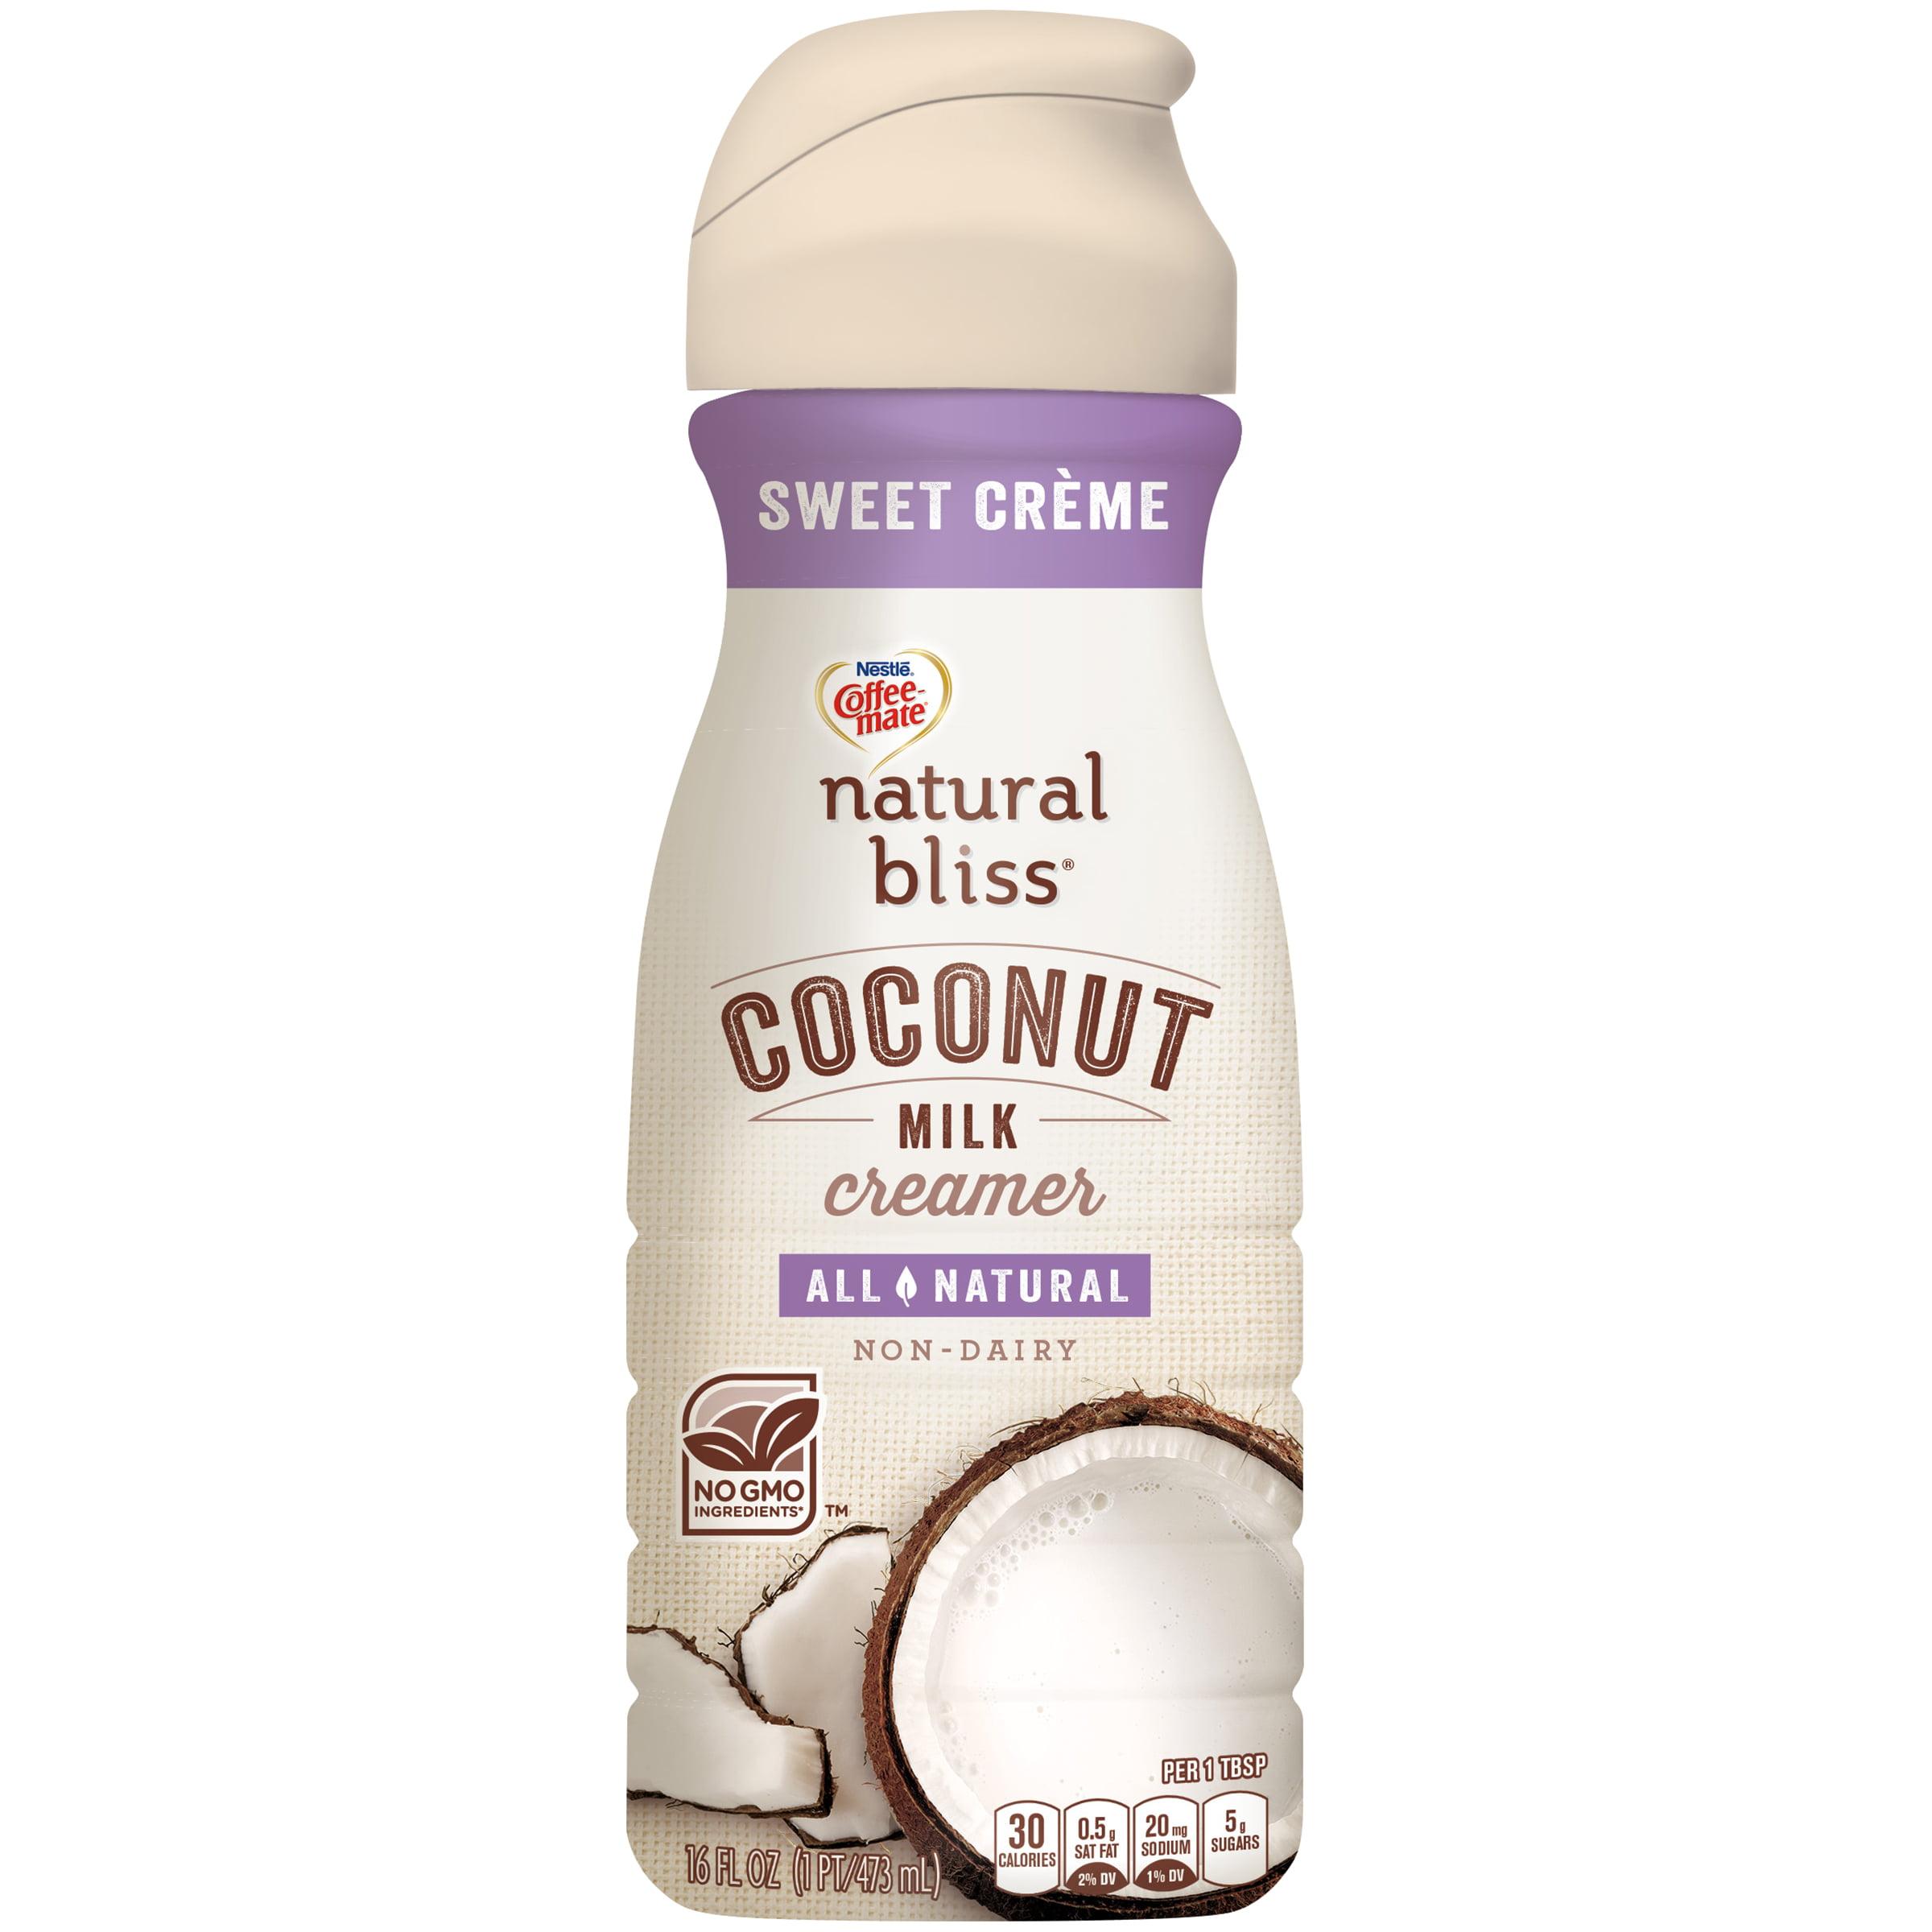 Coffee-mate Natural Bliss Coconut Milk Coffee Creamer